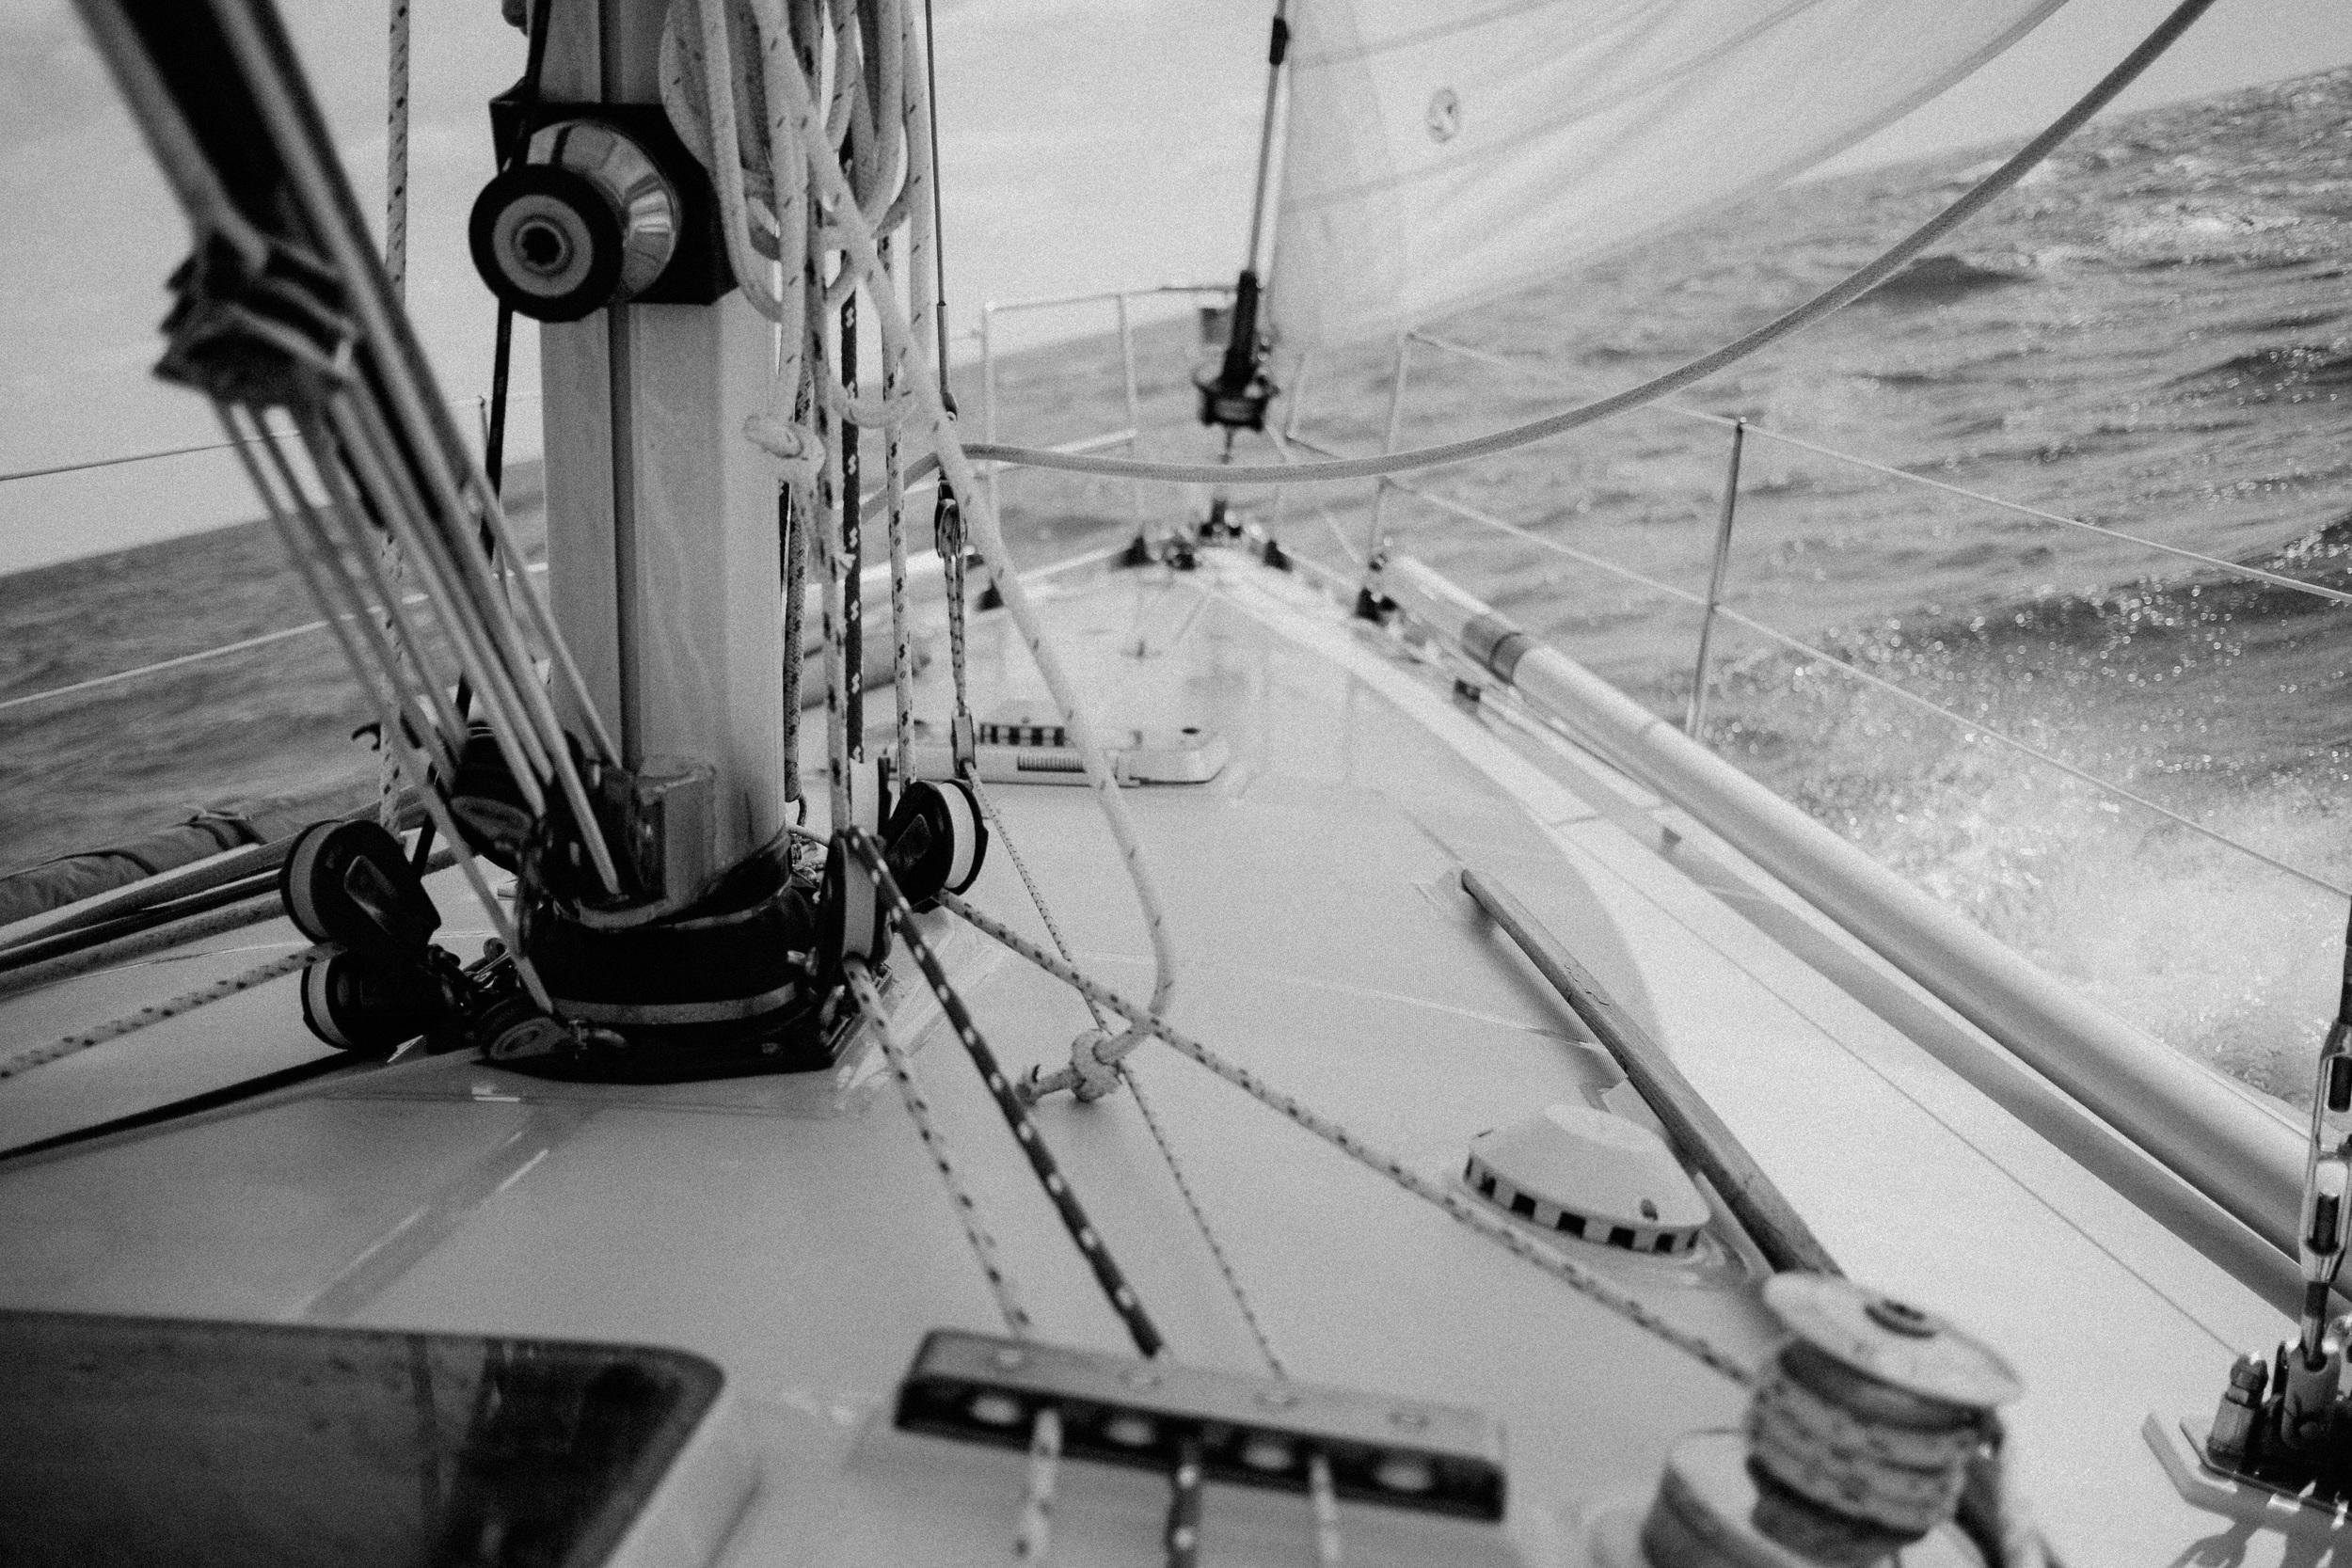 sailing-with-papa-5558.jpg